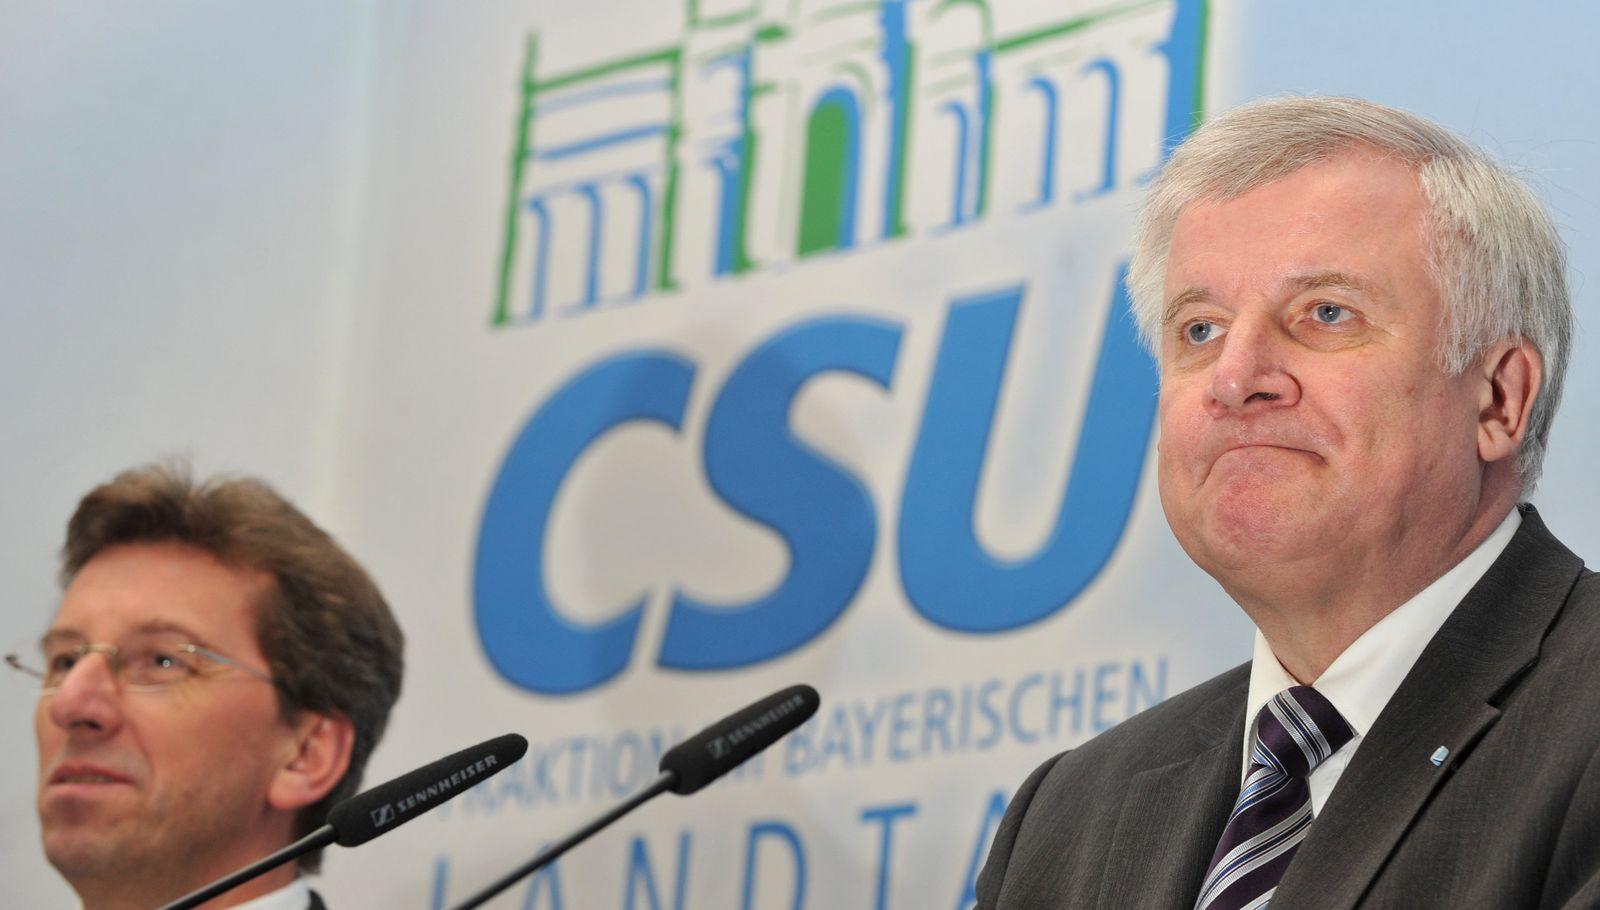 Klausurtagung der CSU-Fraktion - Schmid Seehofer